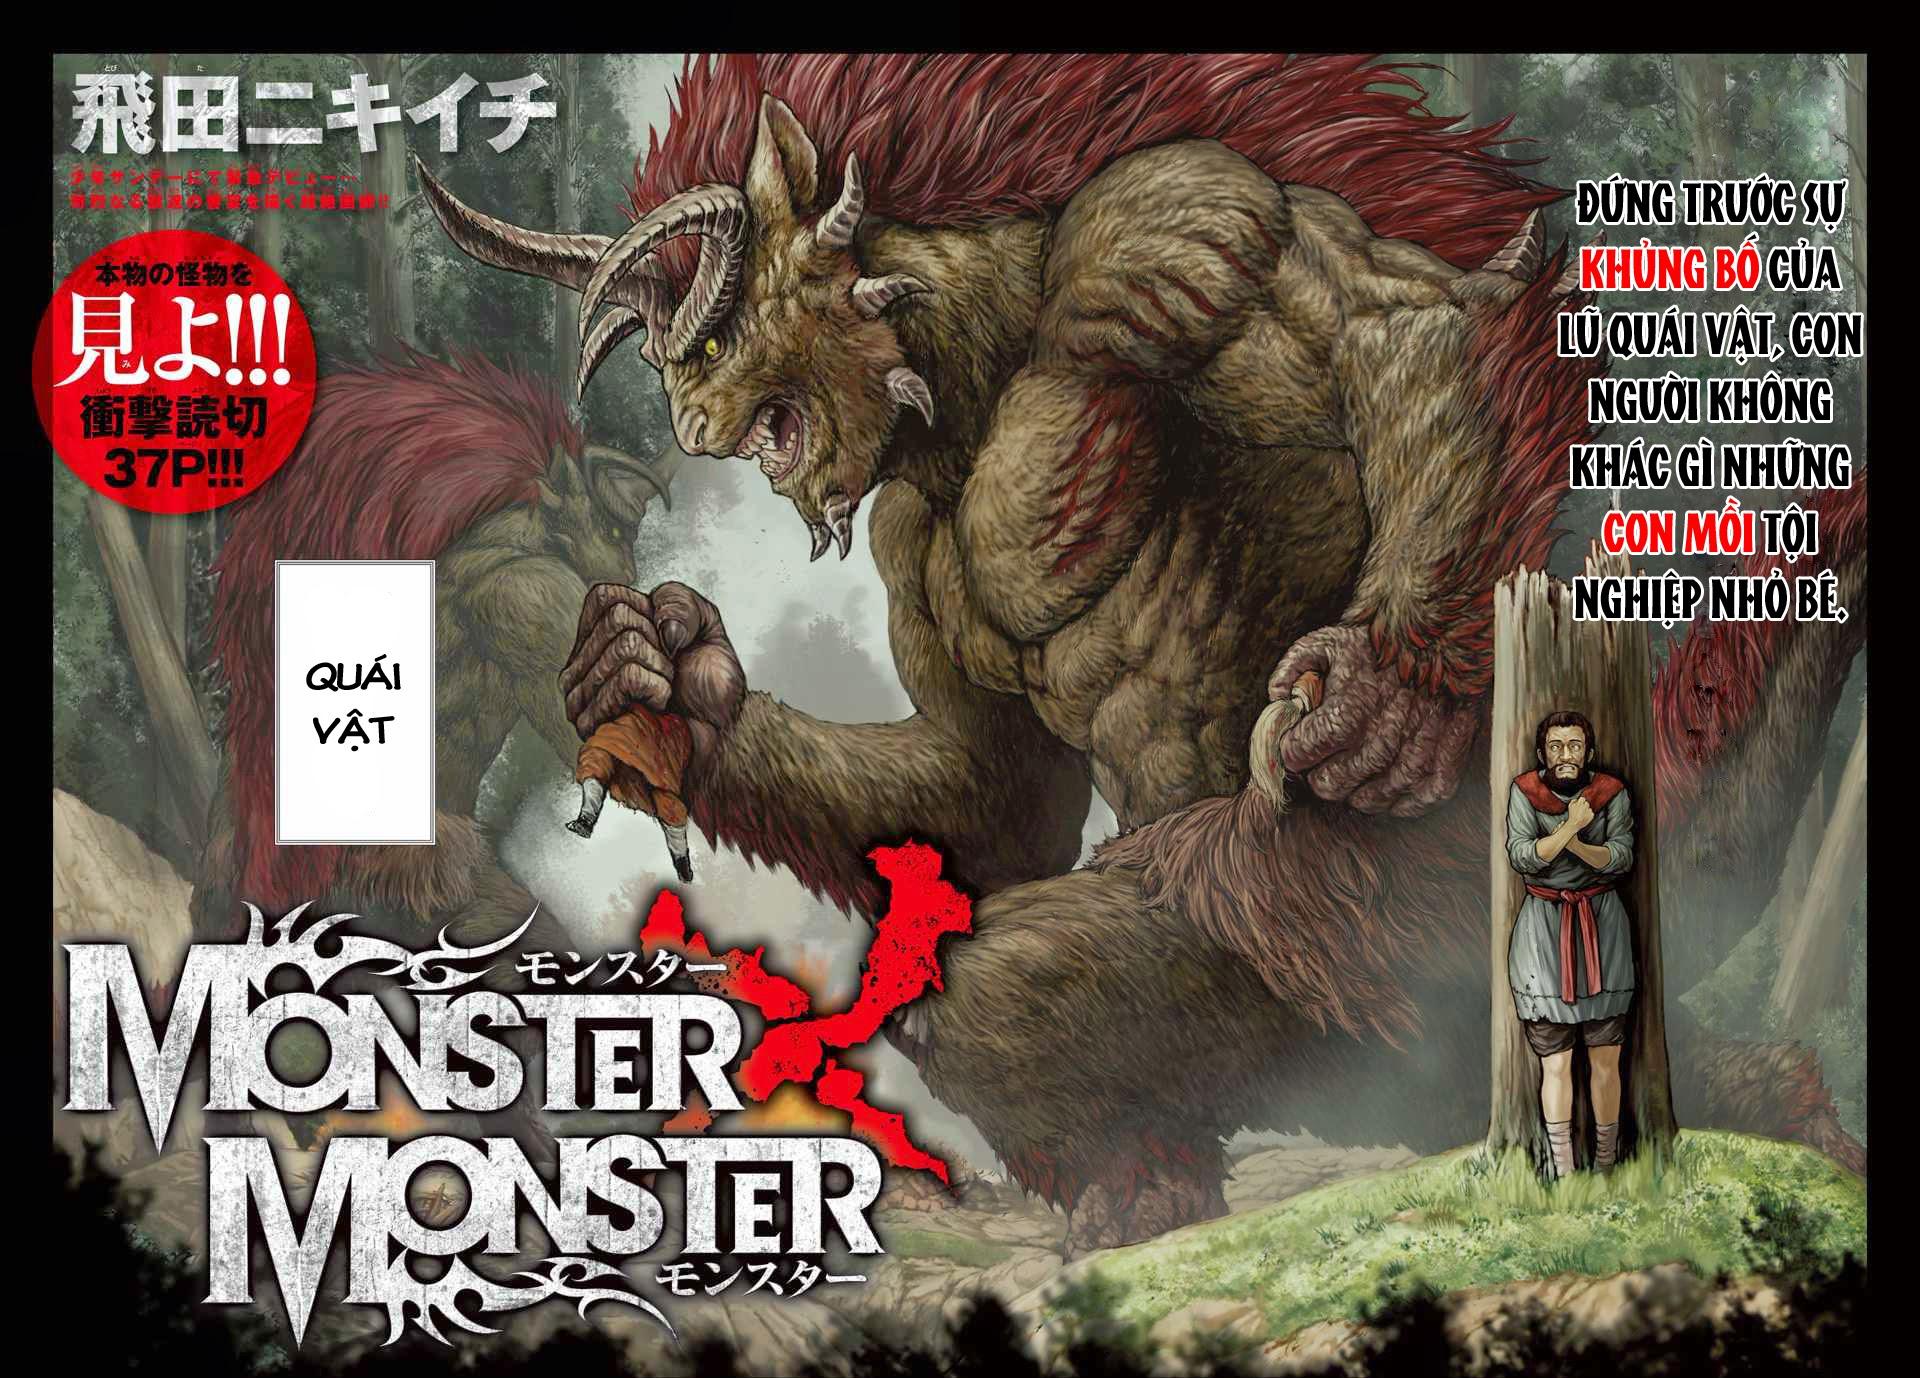 Monster X Monster chapter 1a trang 3